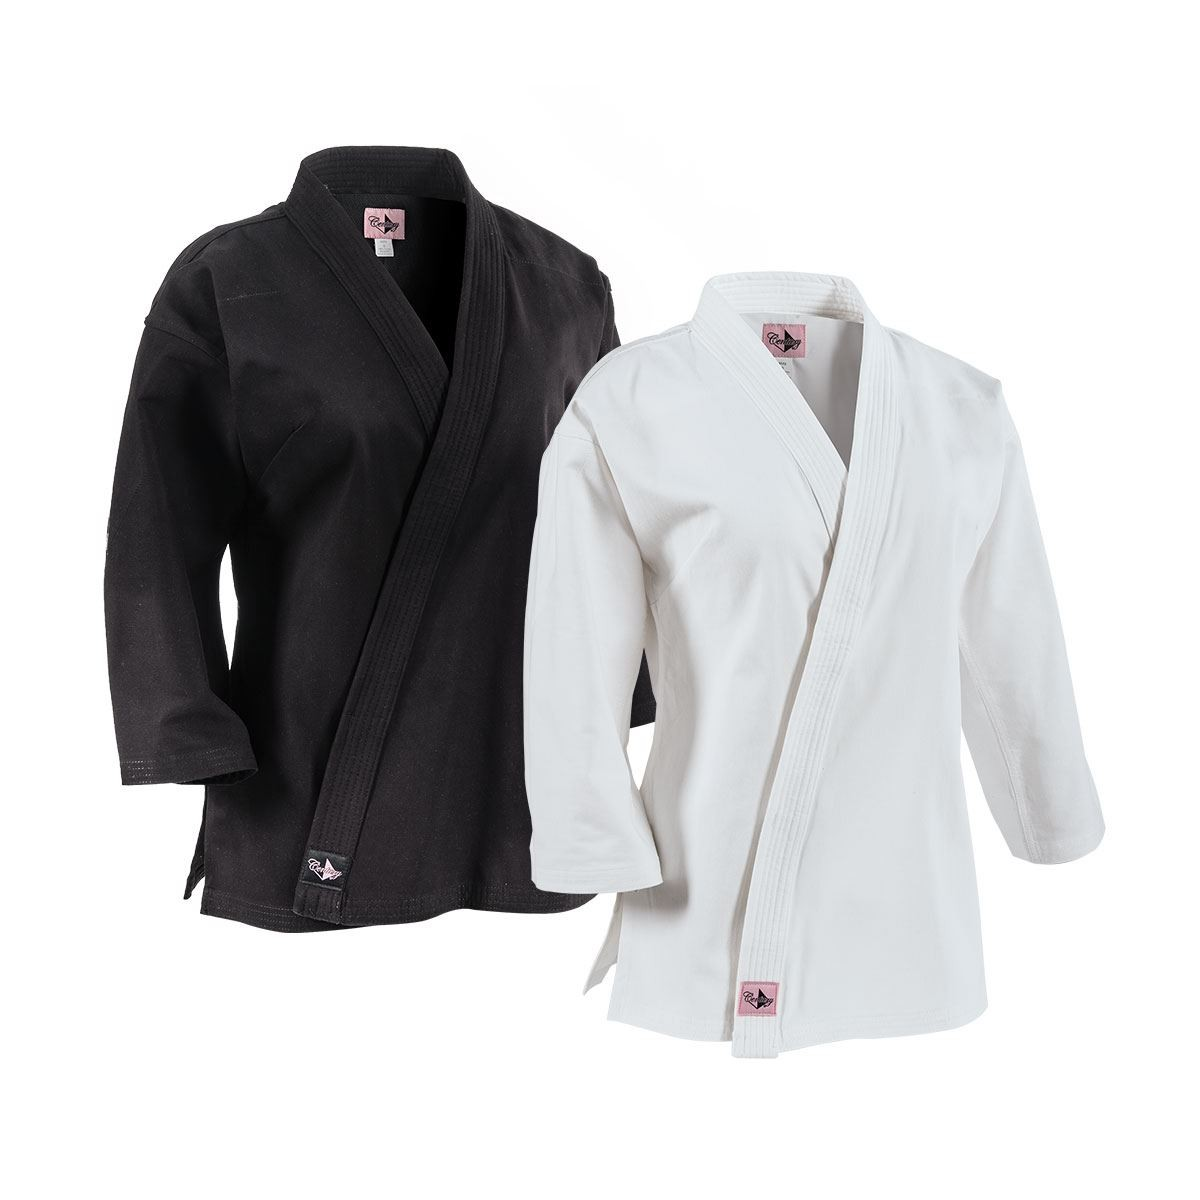 Women's 8 oz. Standard Length Traditional Karate Jacket